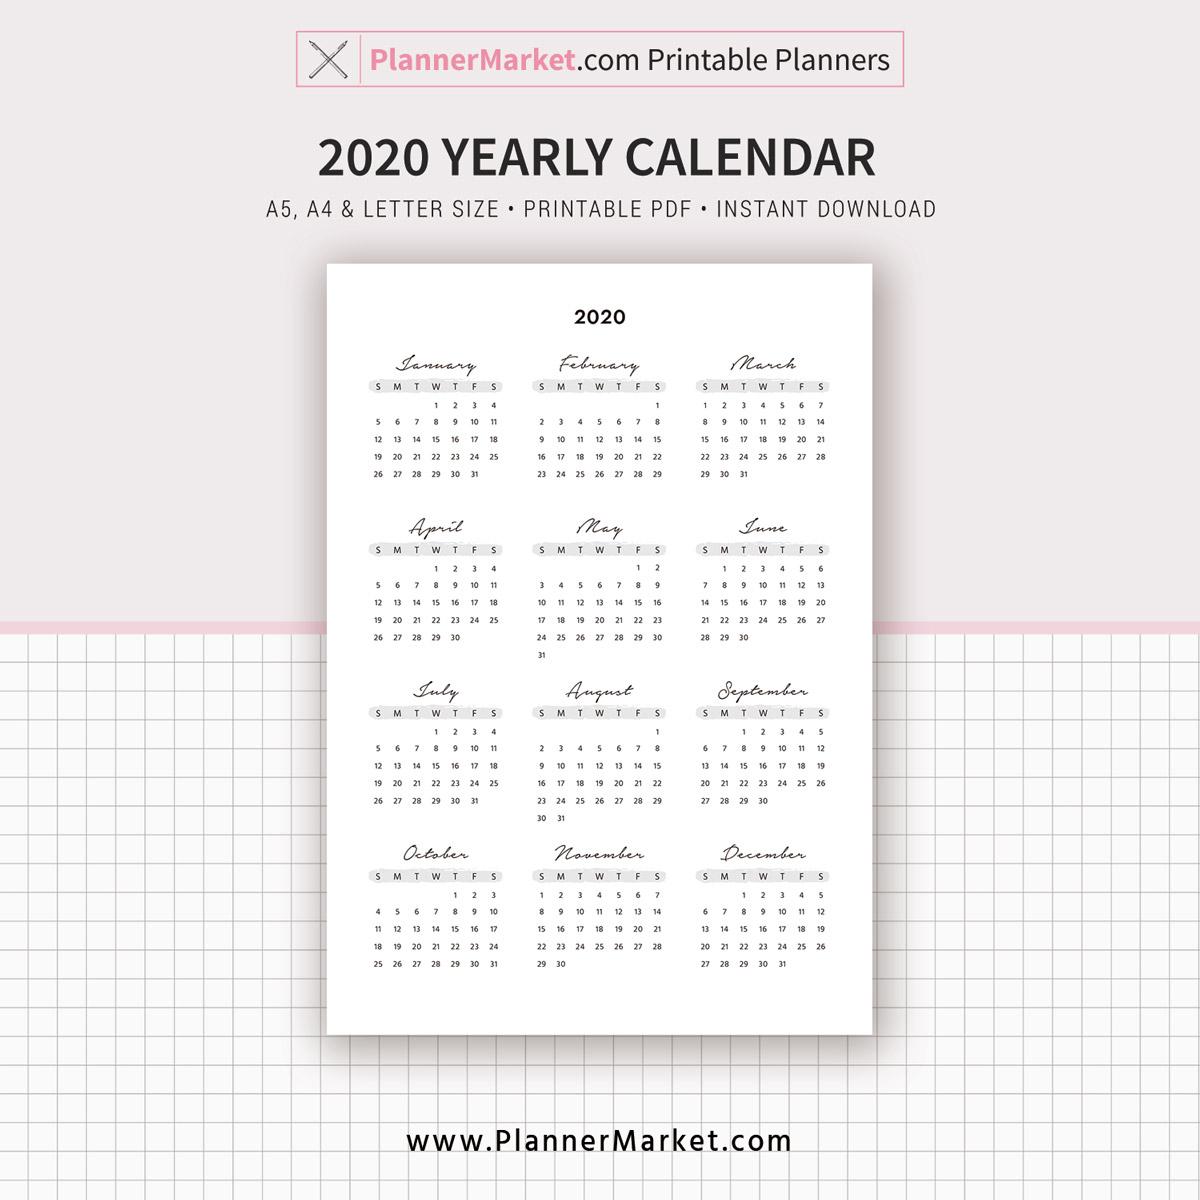 2020 2021 Calendar Yearly Calendar Year At A Glance